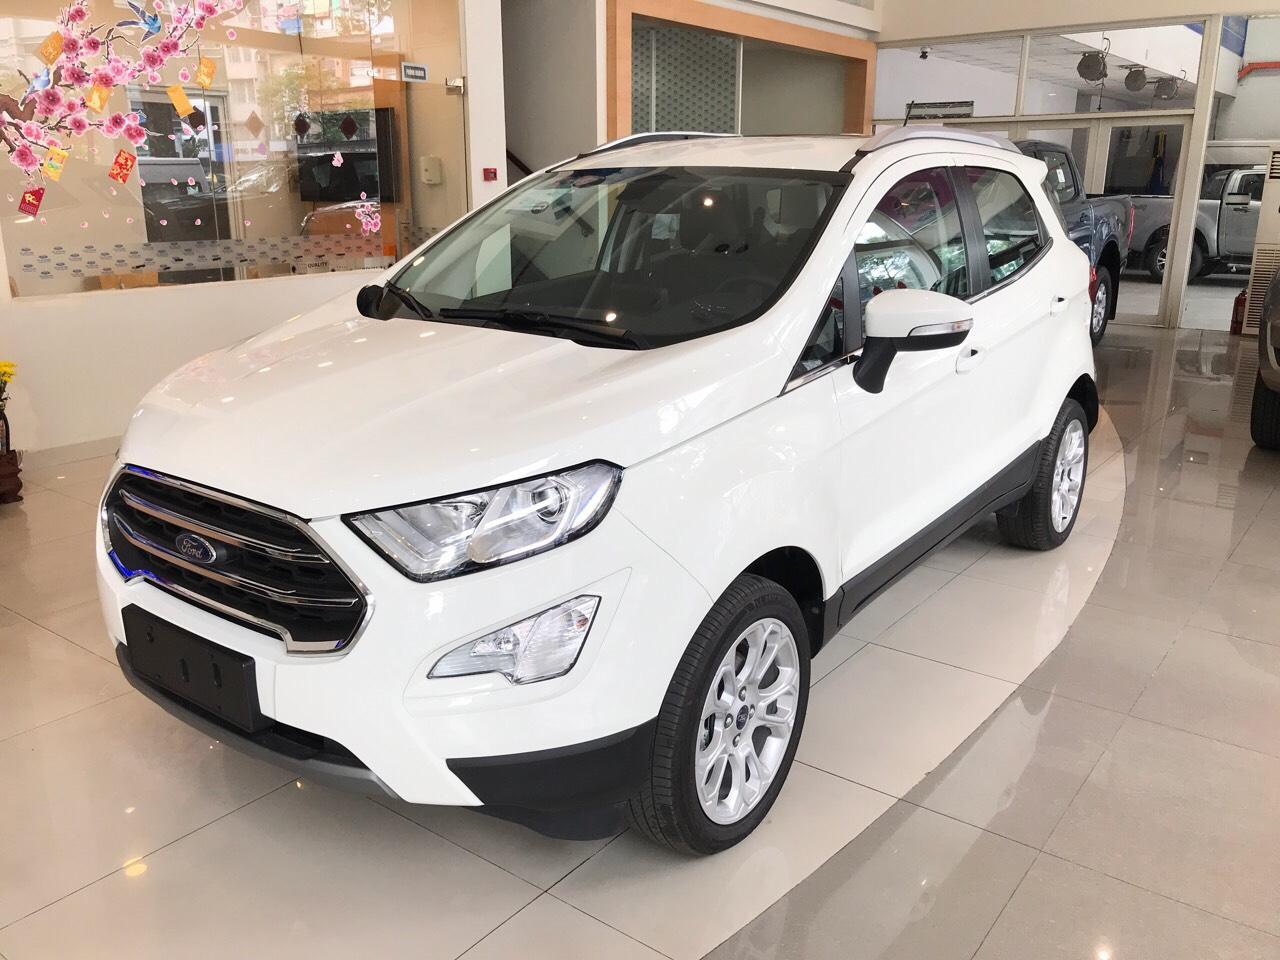 Hình 6: Xe New Ford Ecosport 2018